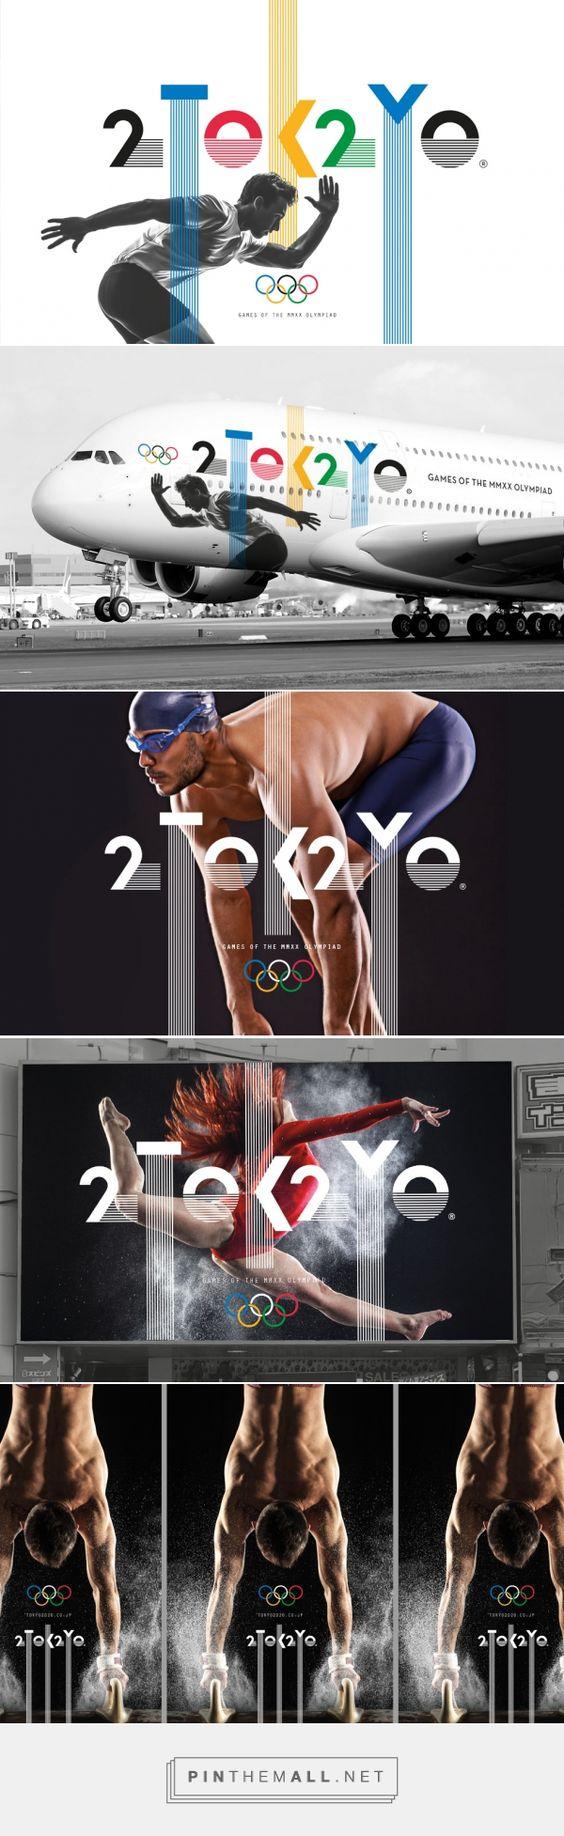 Olympic rings logo rio 2016 olympics logo designed by fred gelli - The 25 Best Rio Summer Olympic Logo Ideas On Pinterest Rio Olympic Logo Rio 2016 Art And Rio 2016 Olympic Logo